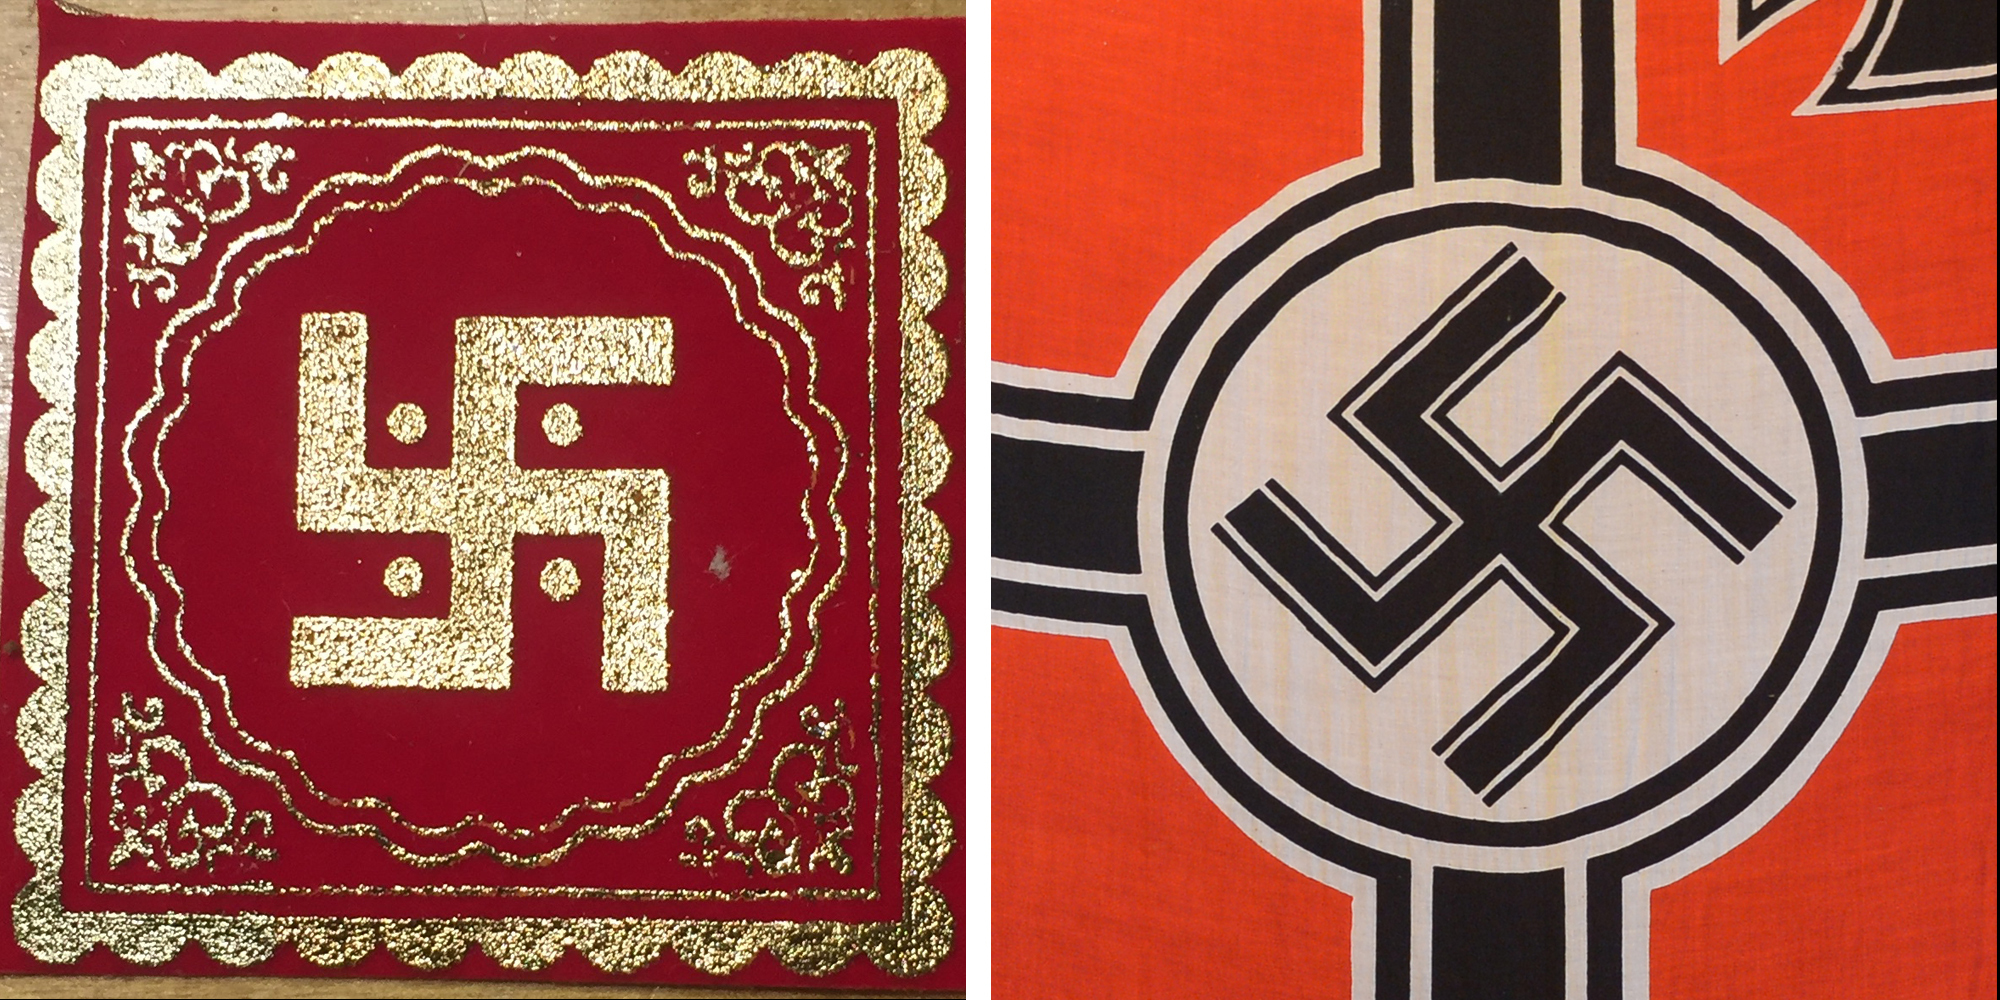 Swastika, Nazi, Symbol